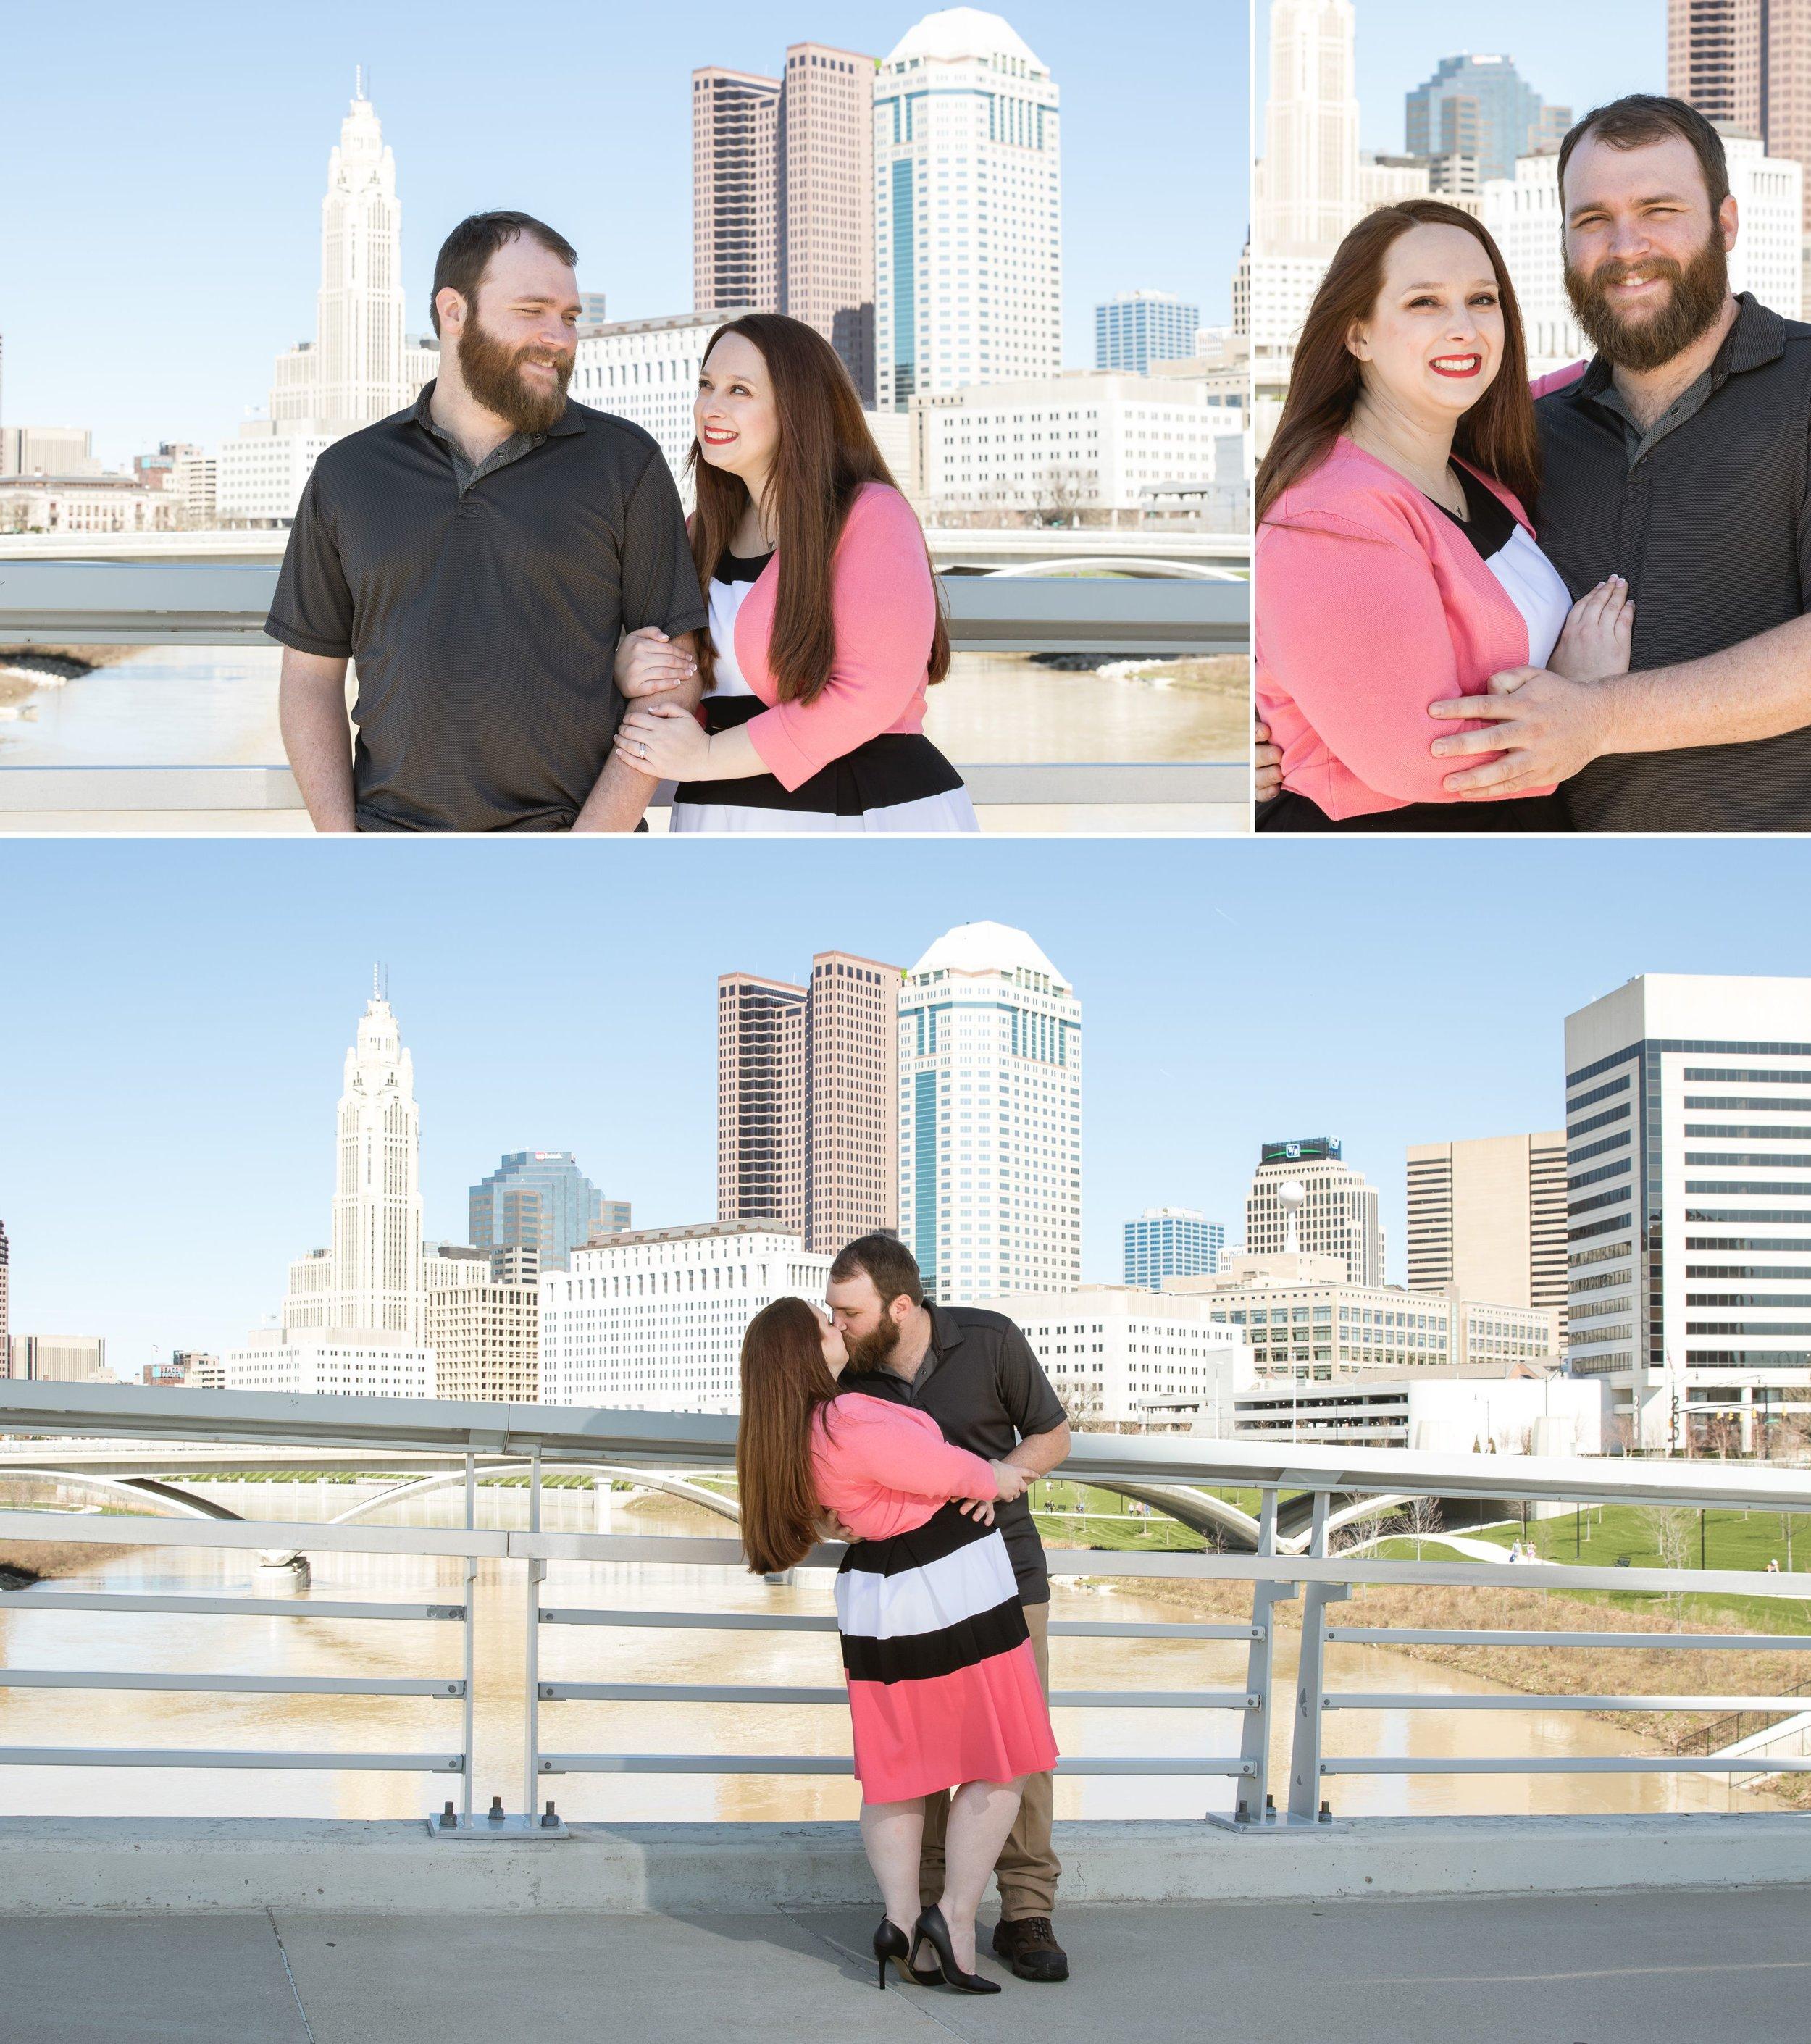 Downtown-Columbus-Ohio-Engagement-Portrait-Session-Bicentennial-Park-McFerson-Commons-Muschlitz-Photography-004.JPG